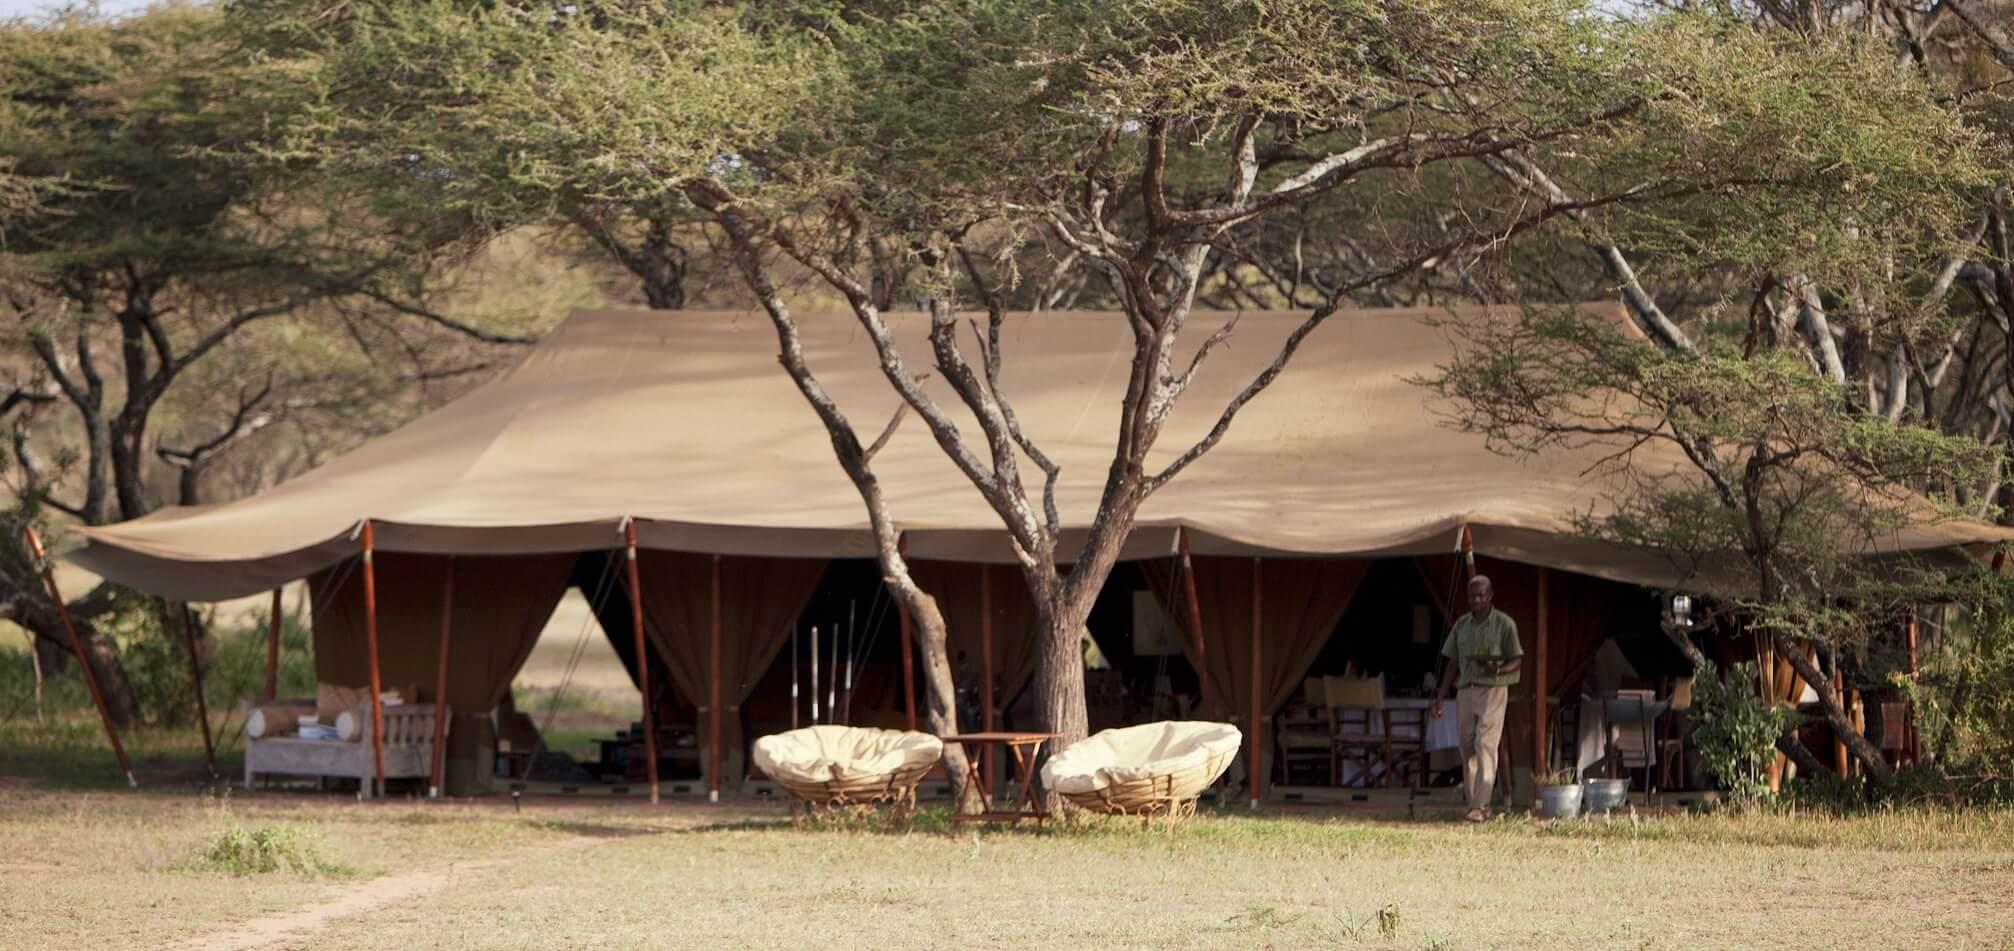 Serian Serengeti South